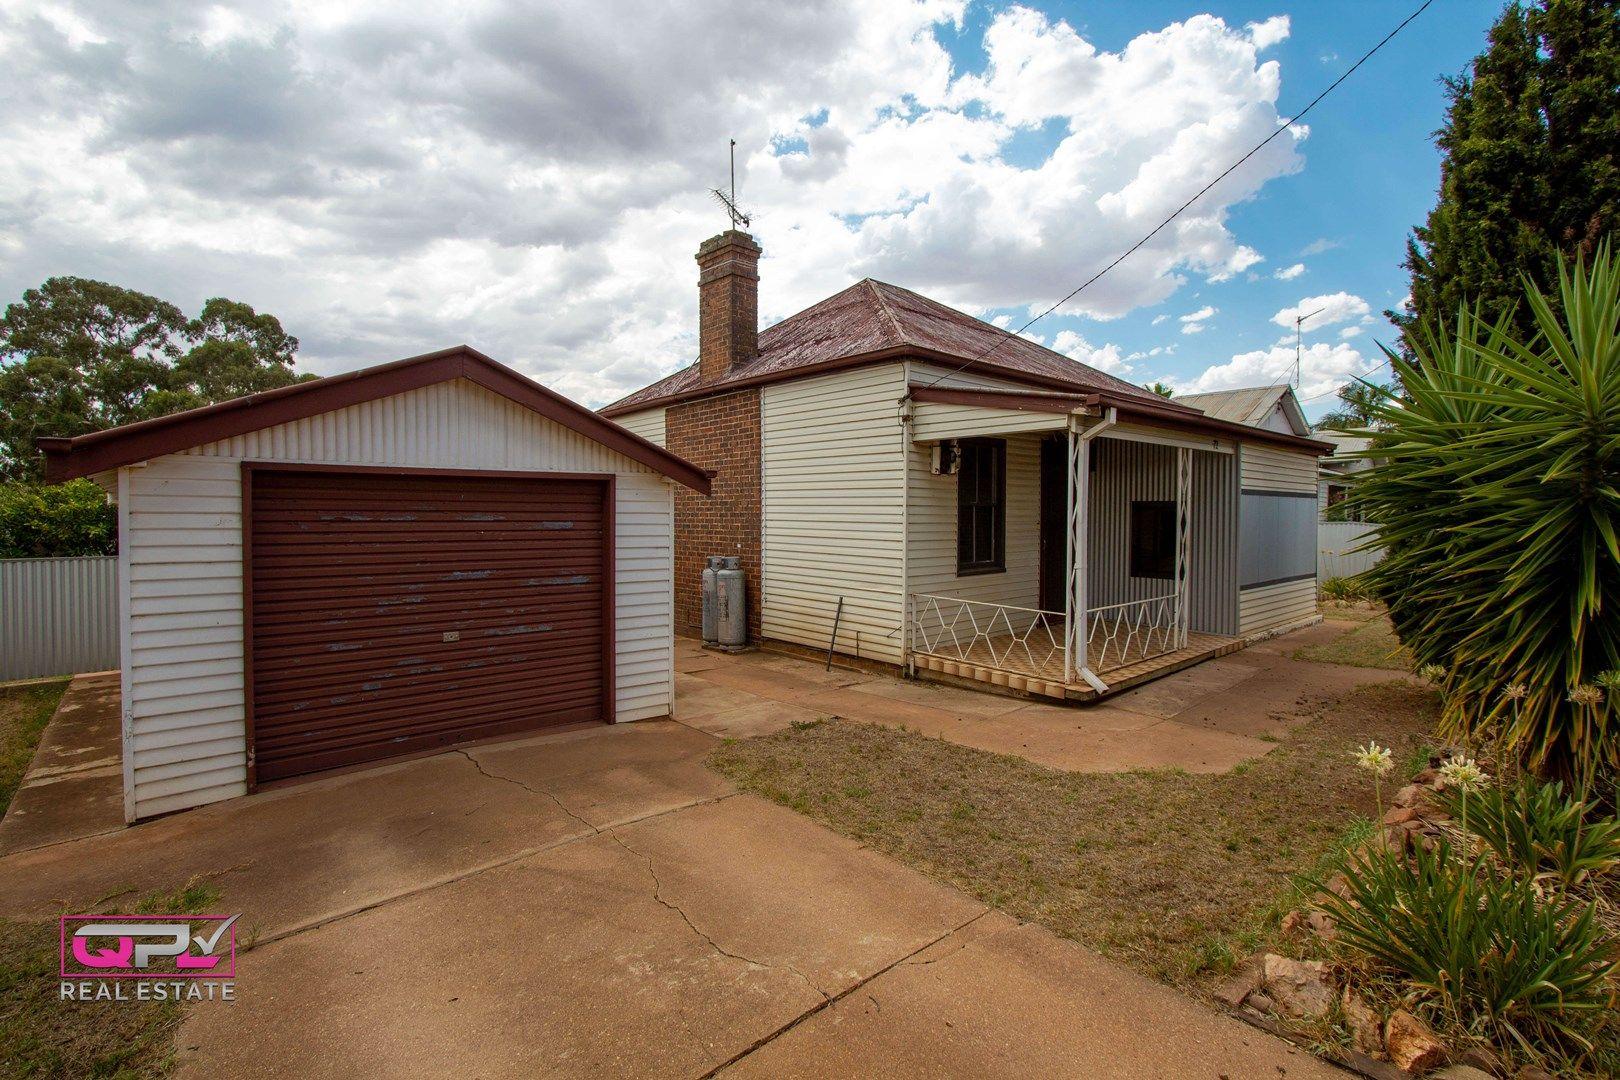 72 Jellicoe Street, Temora NSW 2666, Image 0